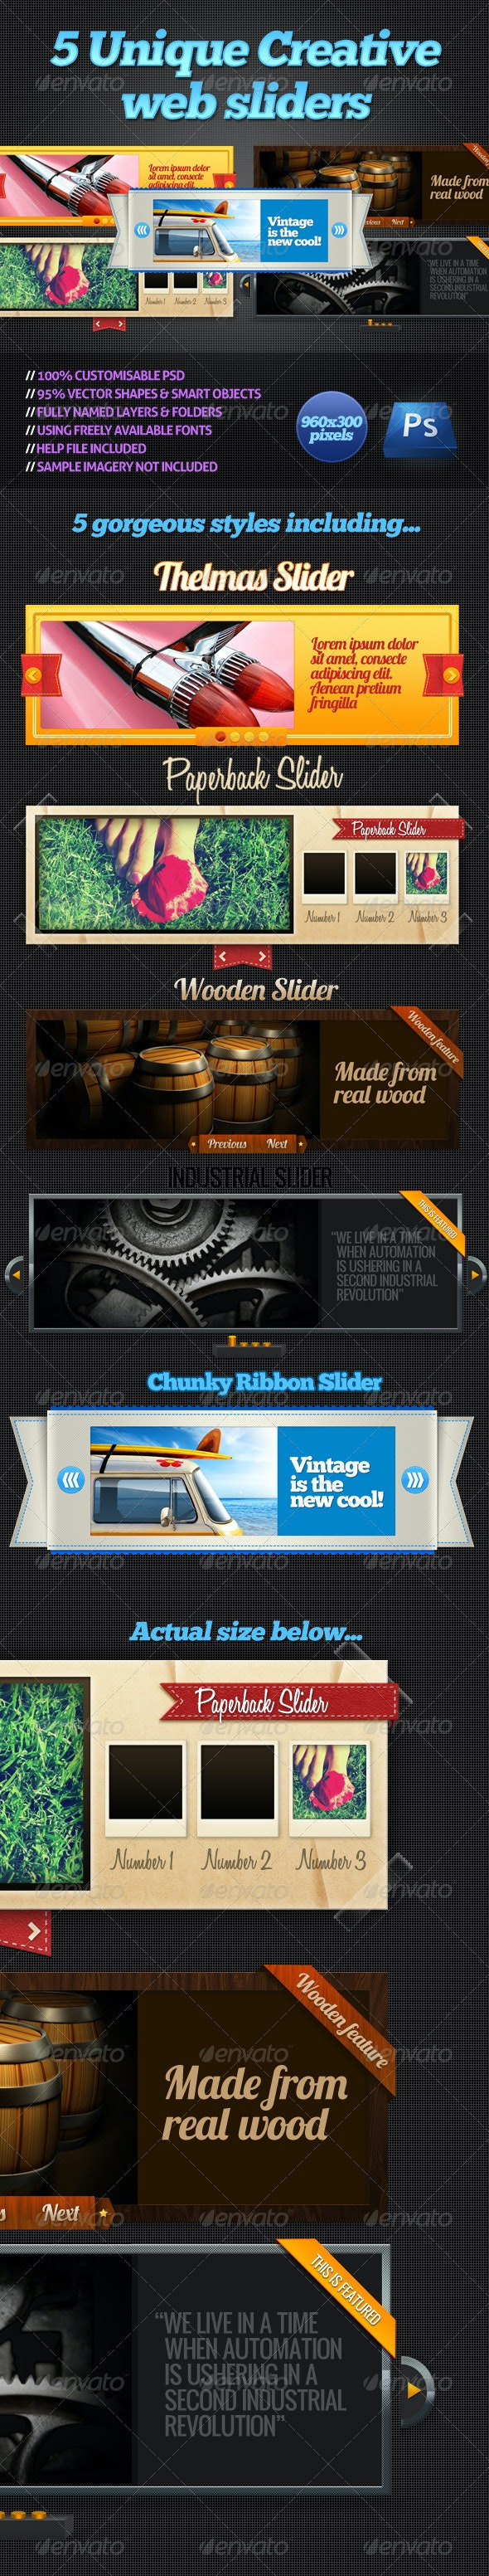 5 Creative Web Sliders - Sliders & Features Web Elements